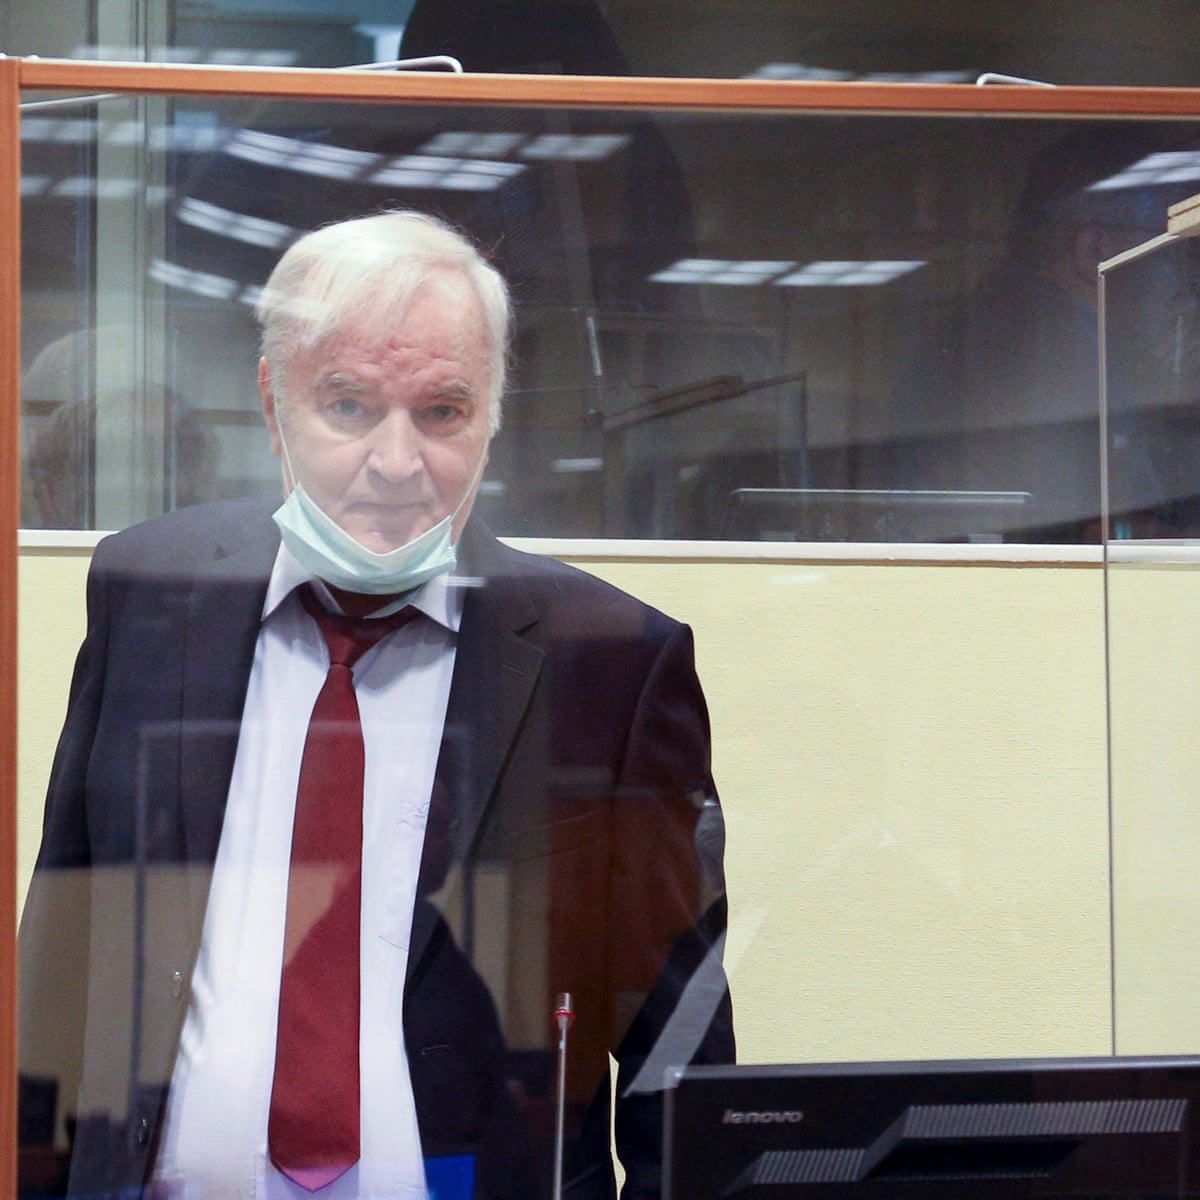 Ratko Mladić to hear final ruling on genocide conviction | Ratko Mladić |  The Guardian